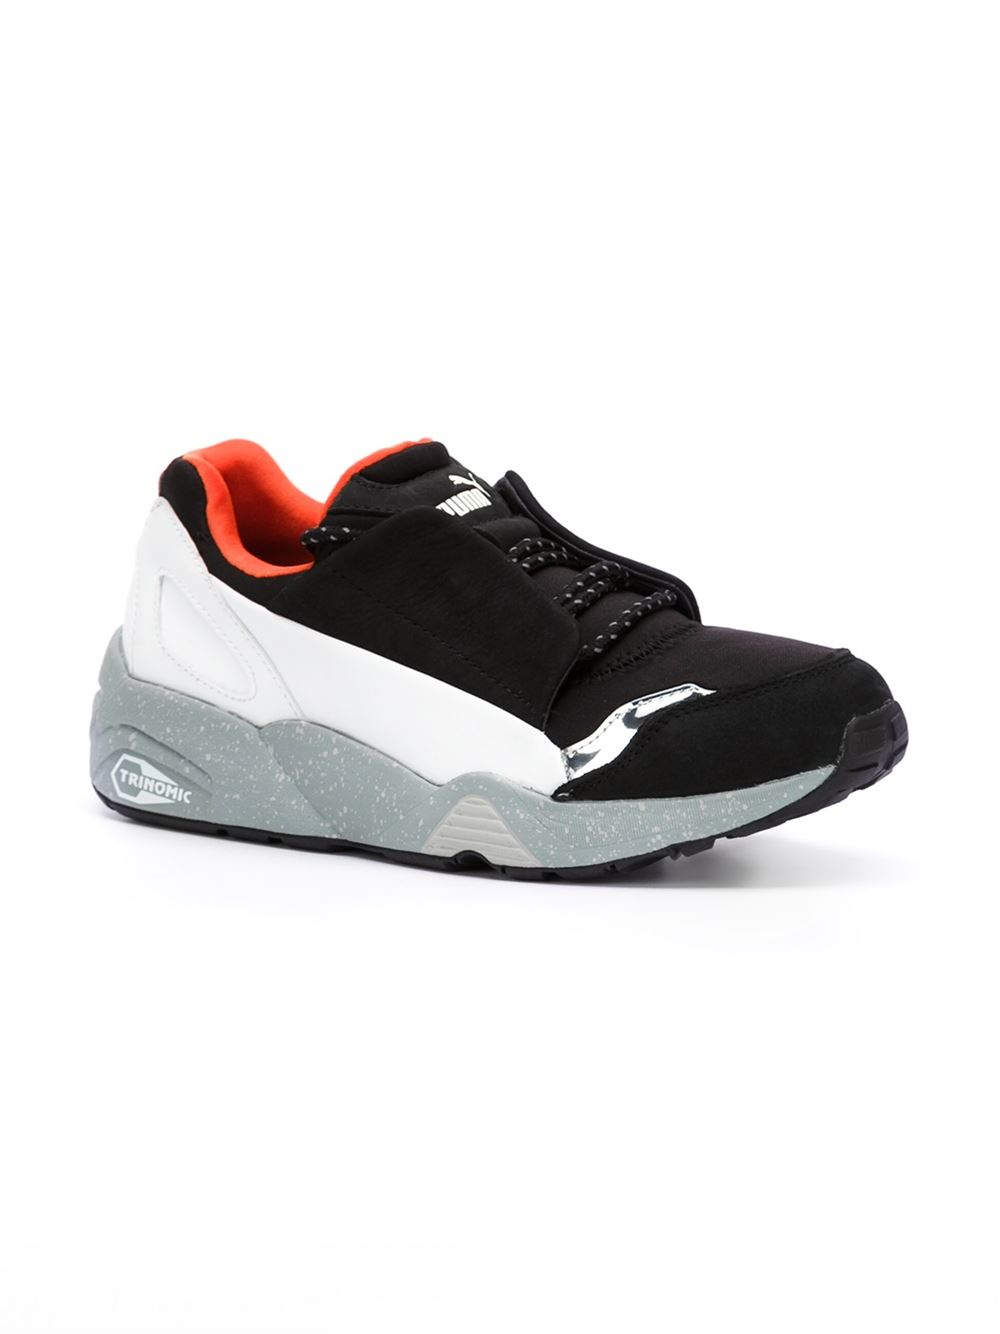 Alexander Mcqueen X Puma Disc Leather Low Top Sneakers In